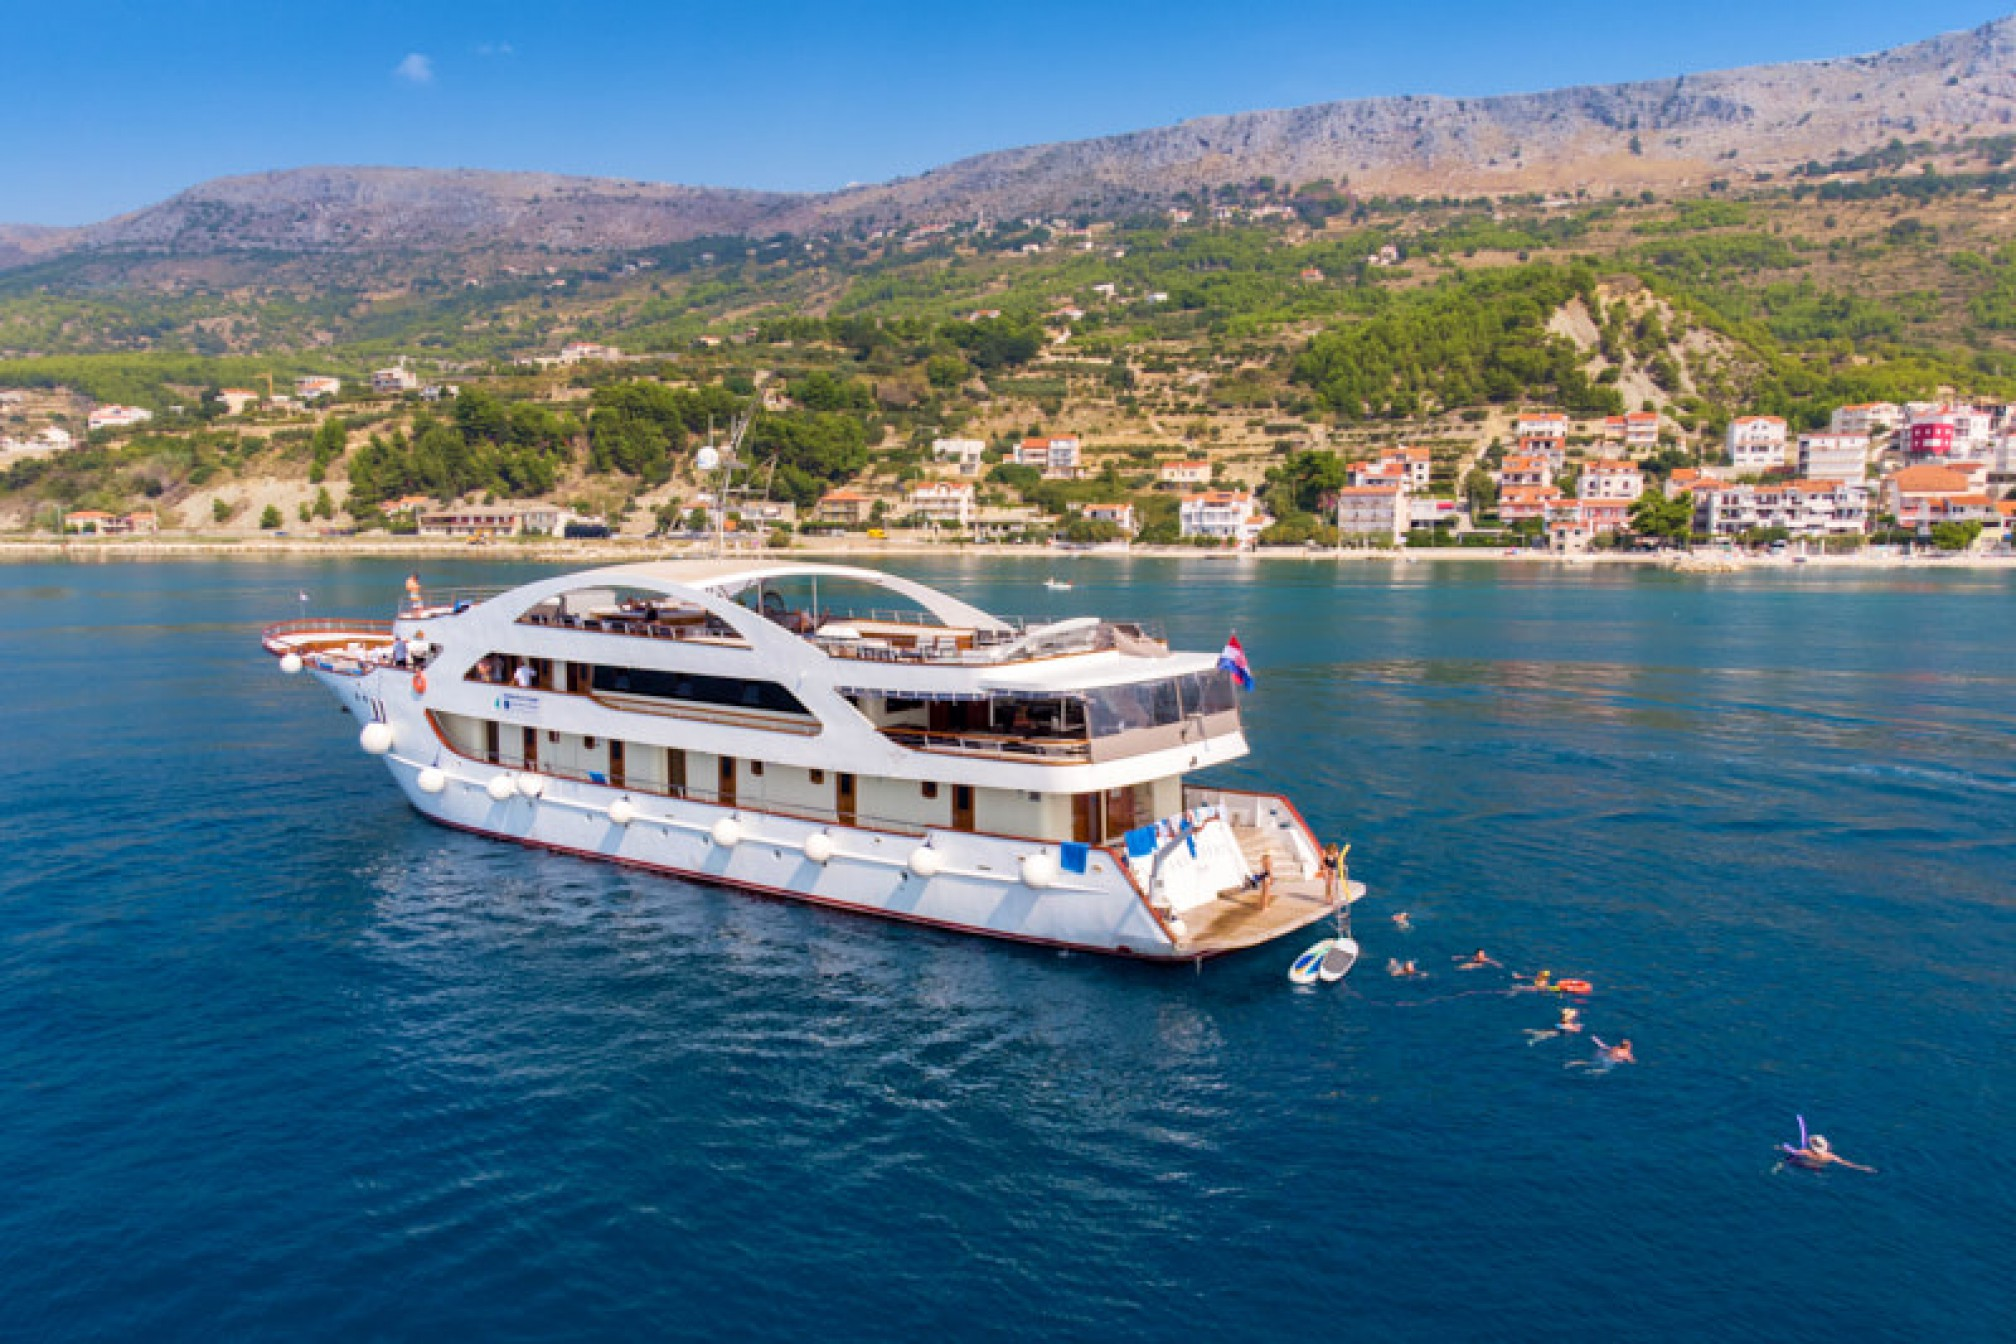 Rental yacht President 40 pax anchored